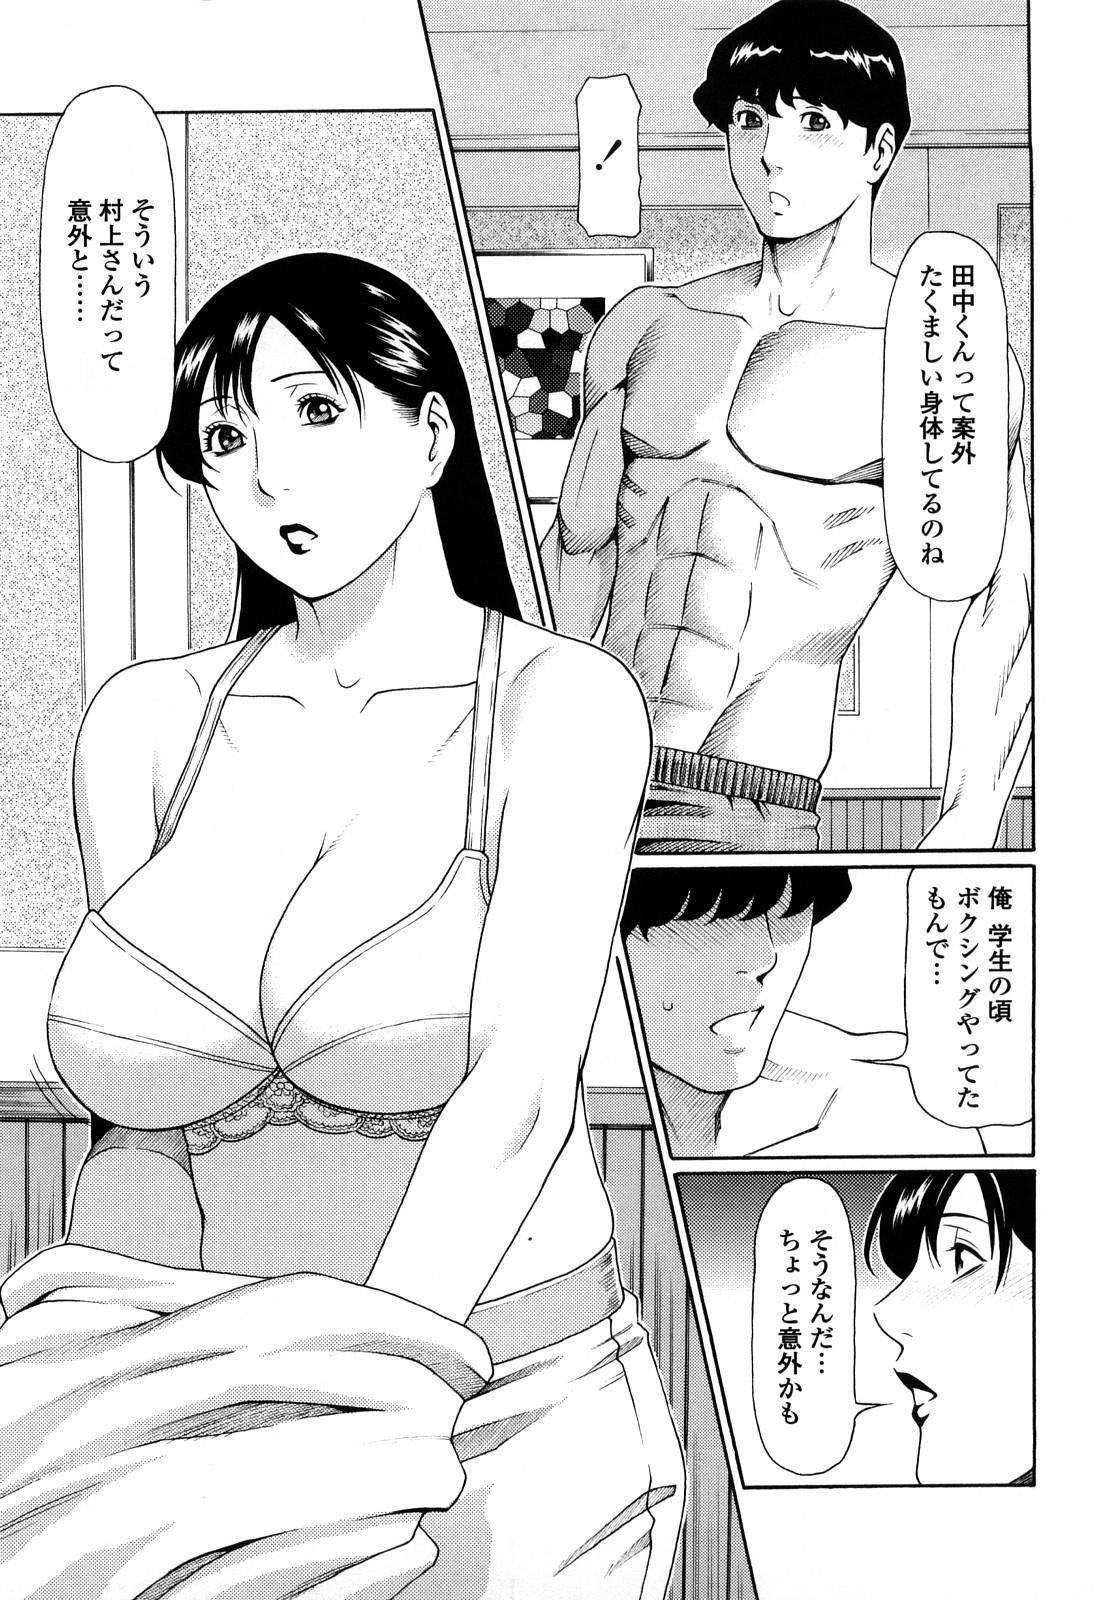 [Takasugi Kou] Kindan no Haha-Ana - Immorality Love-Hole [Decensored] 142